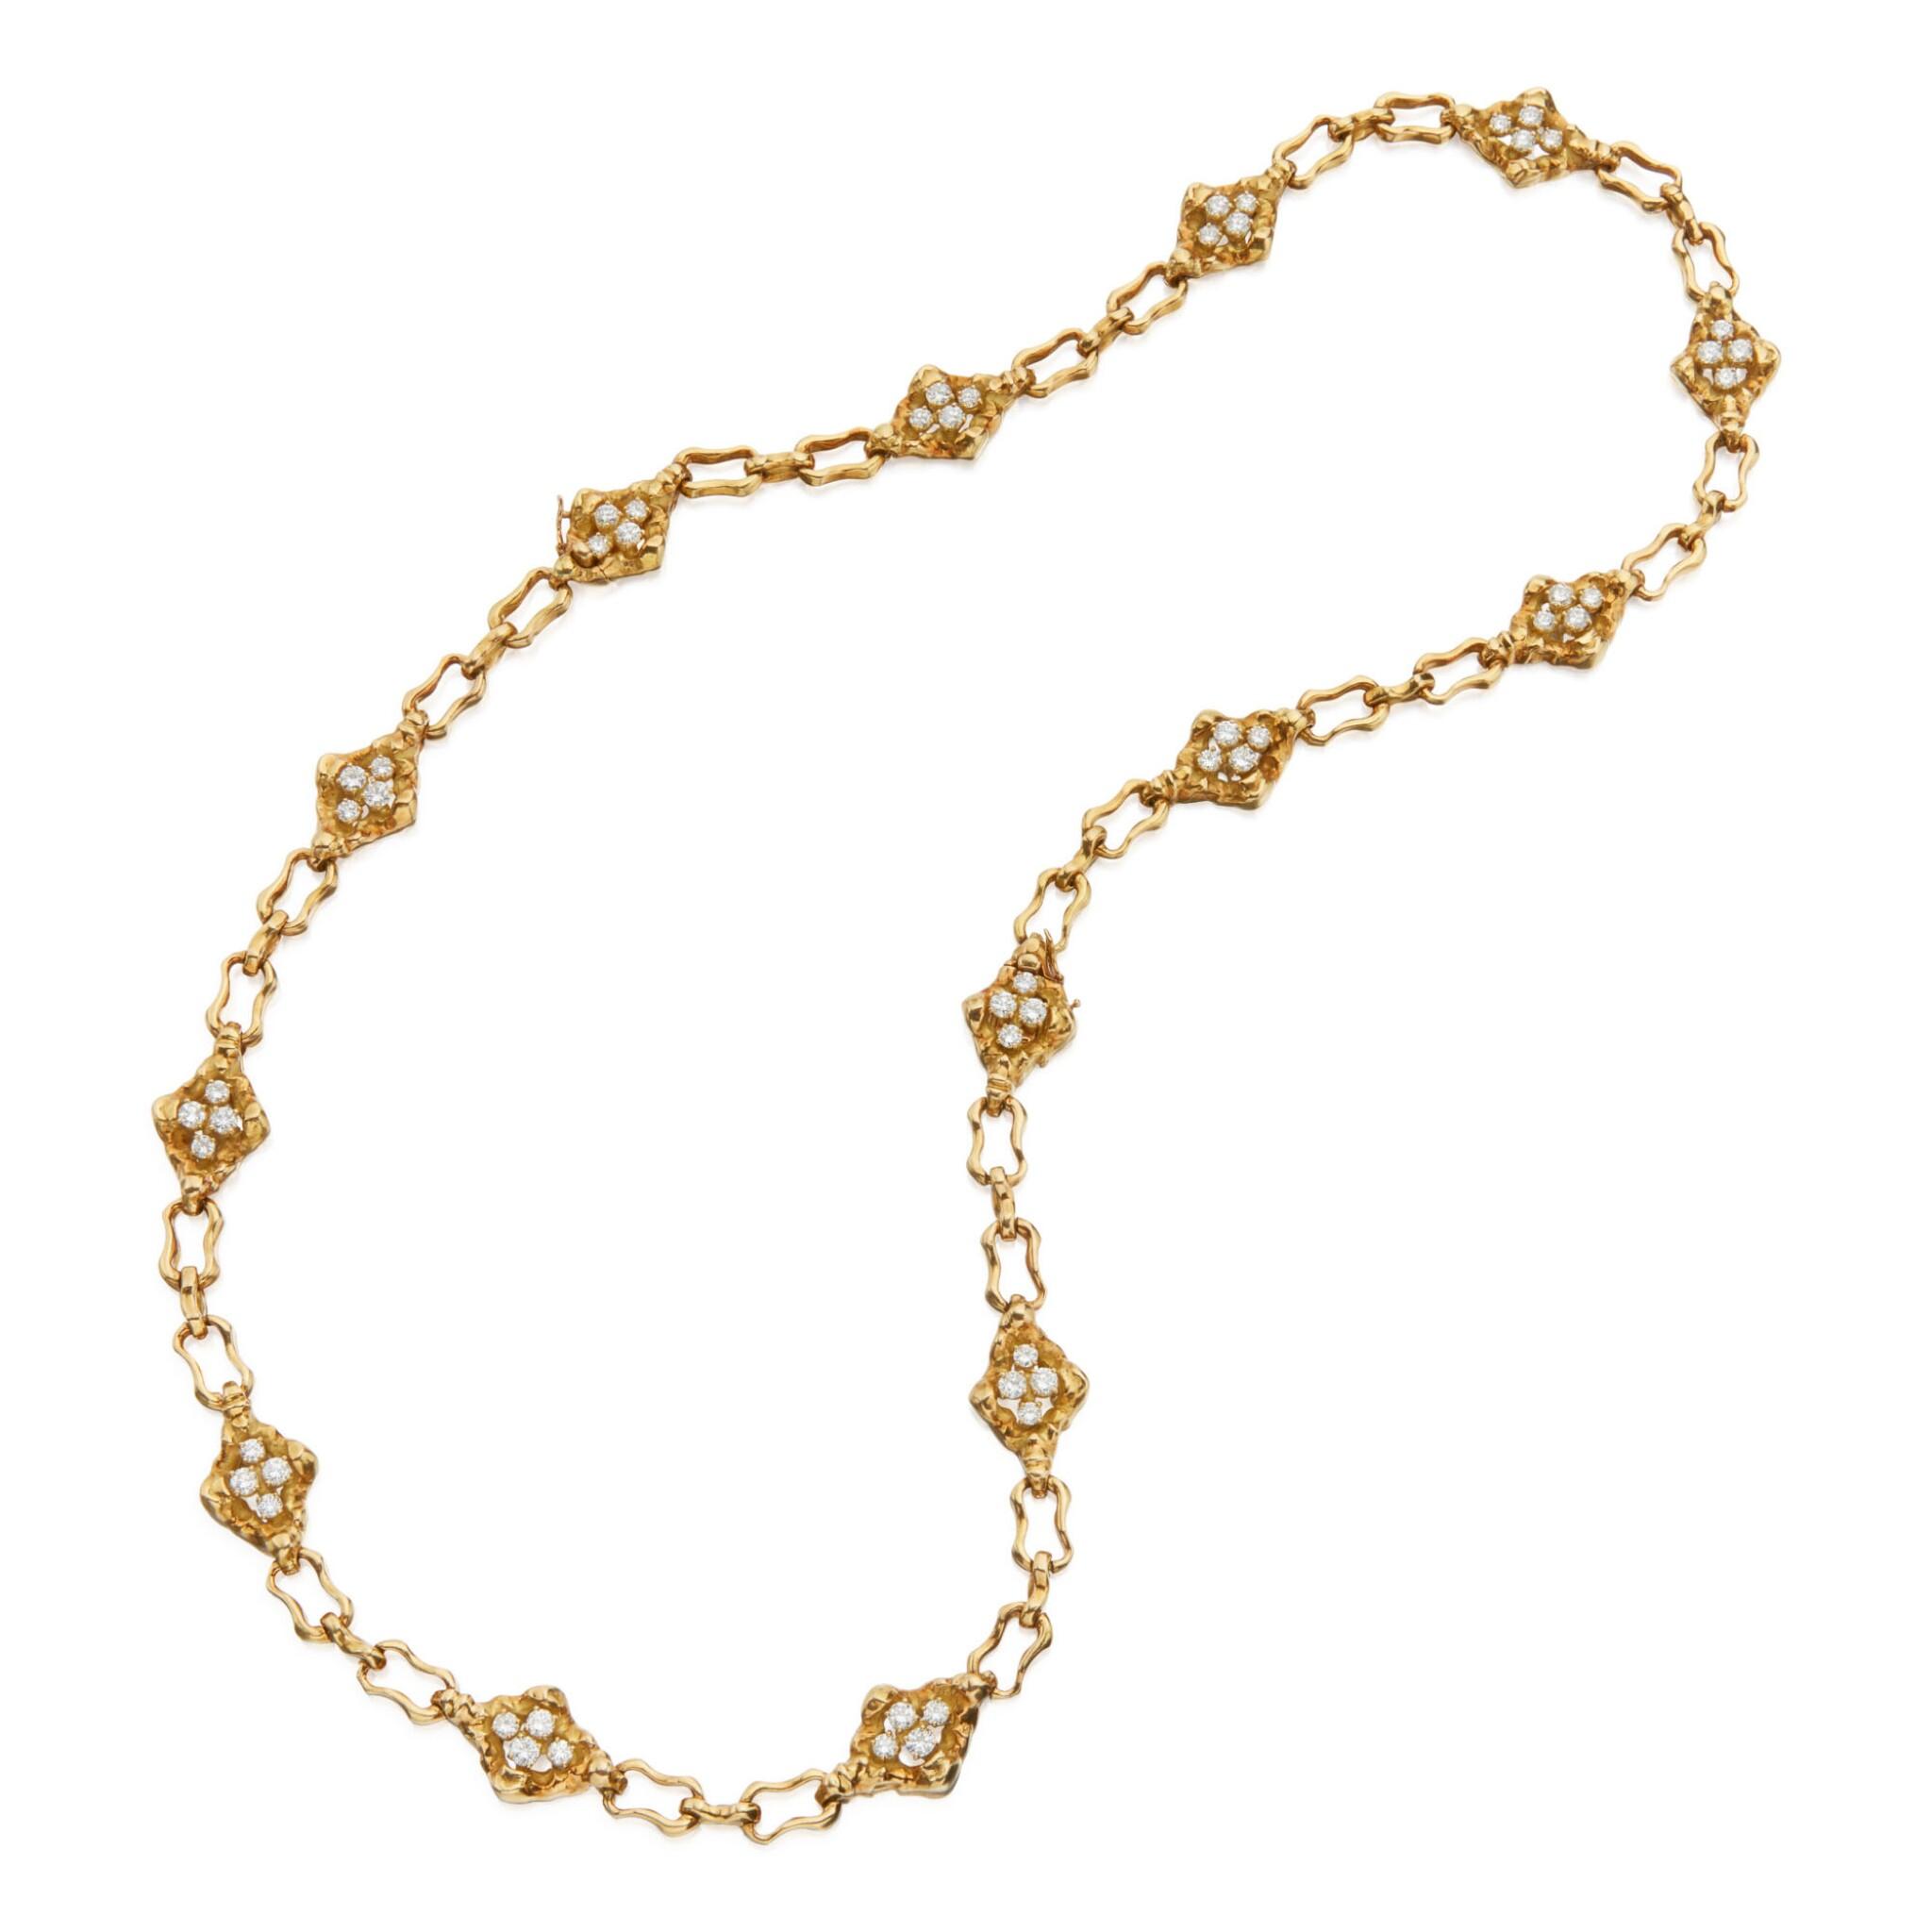 GOLD AND DIAMOND NECKLACE, BOUCHERON, FRANCE